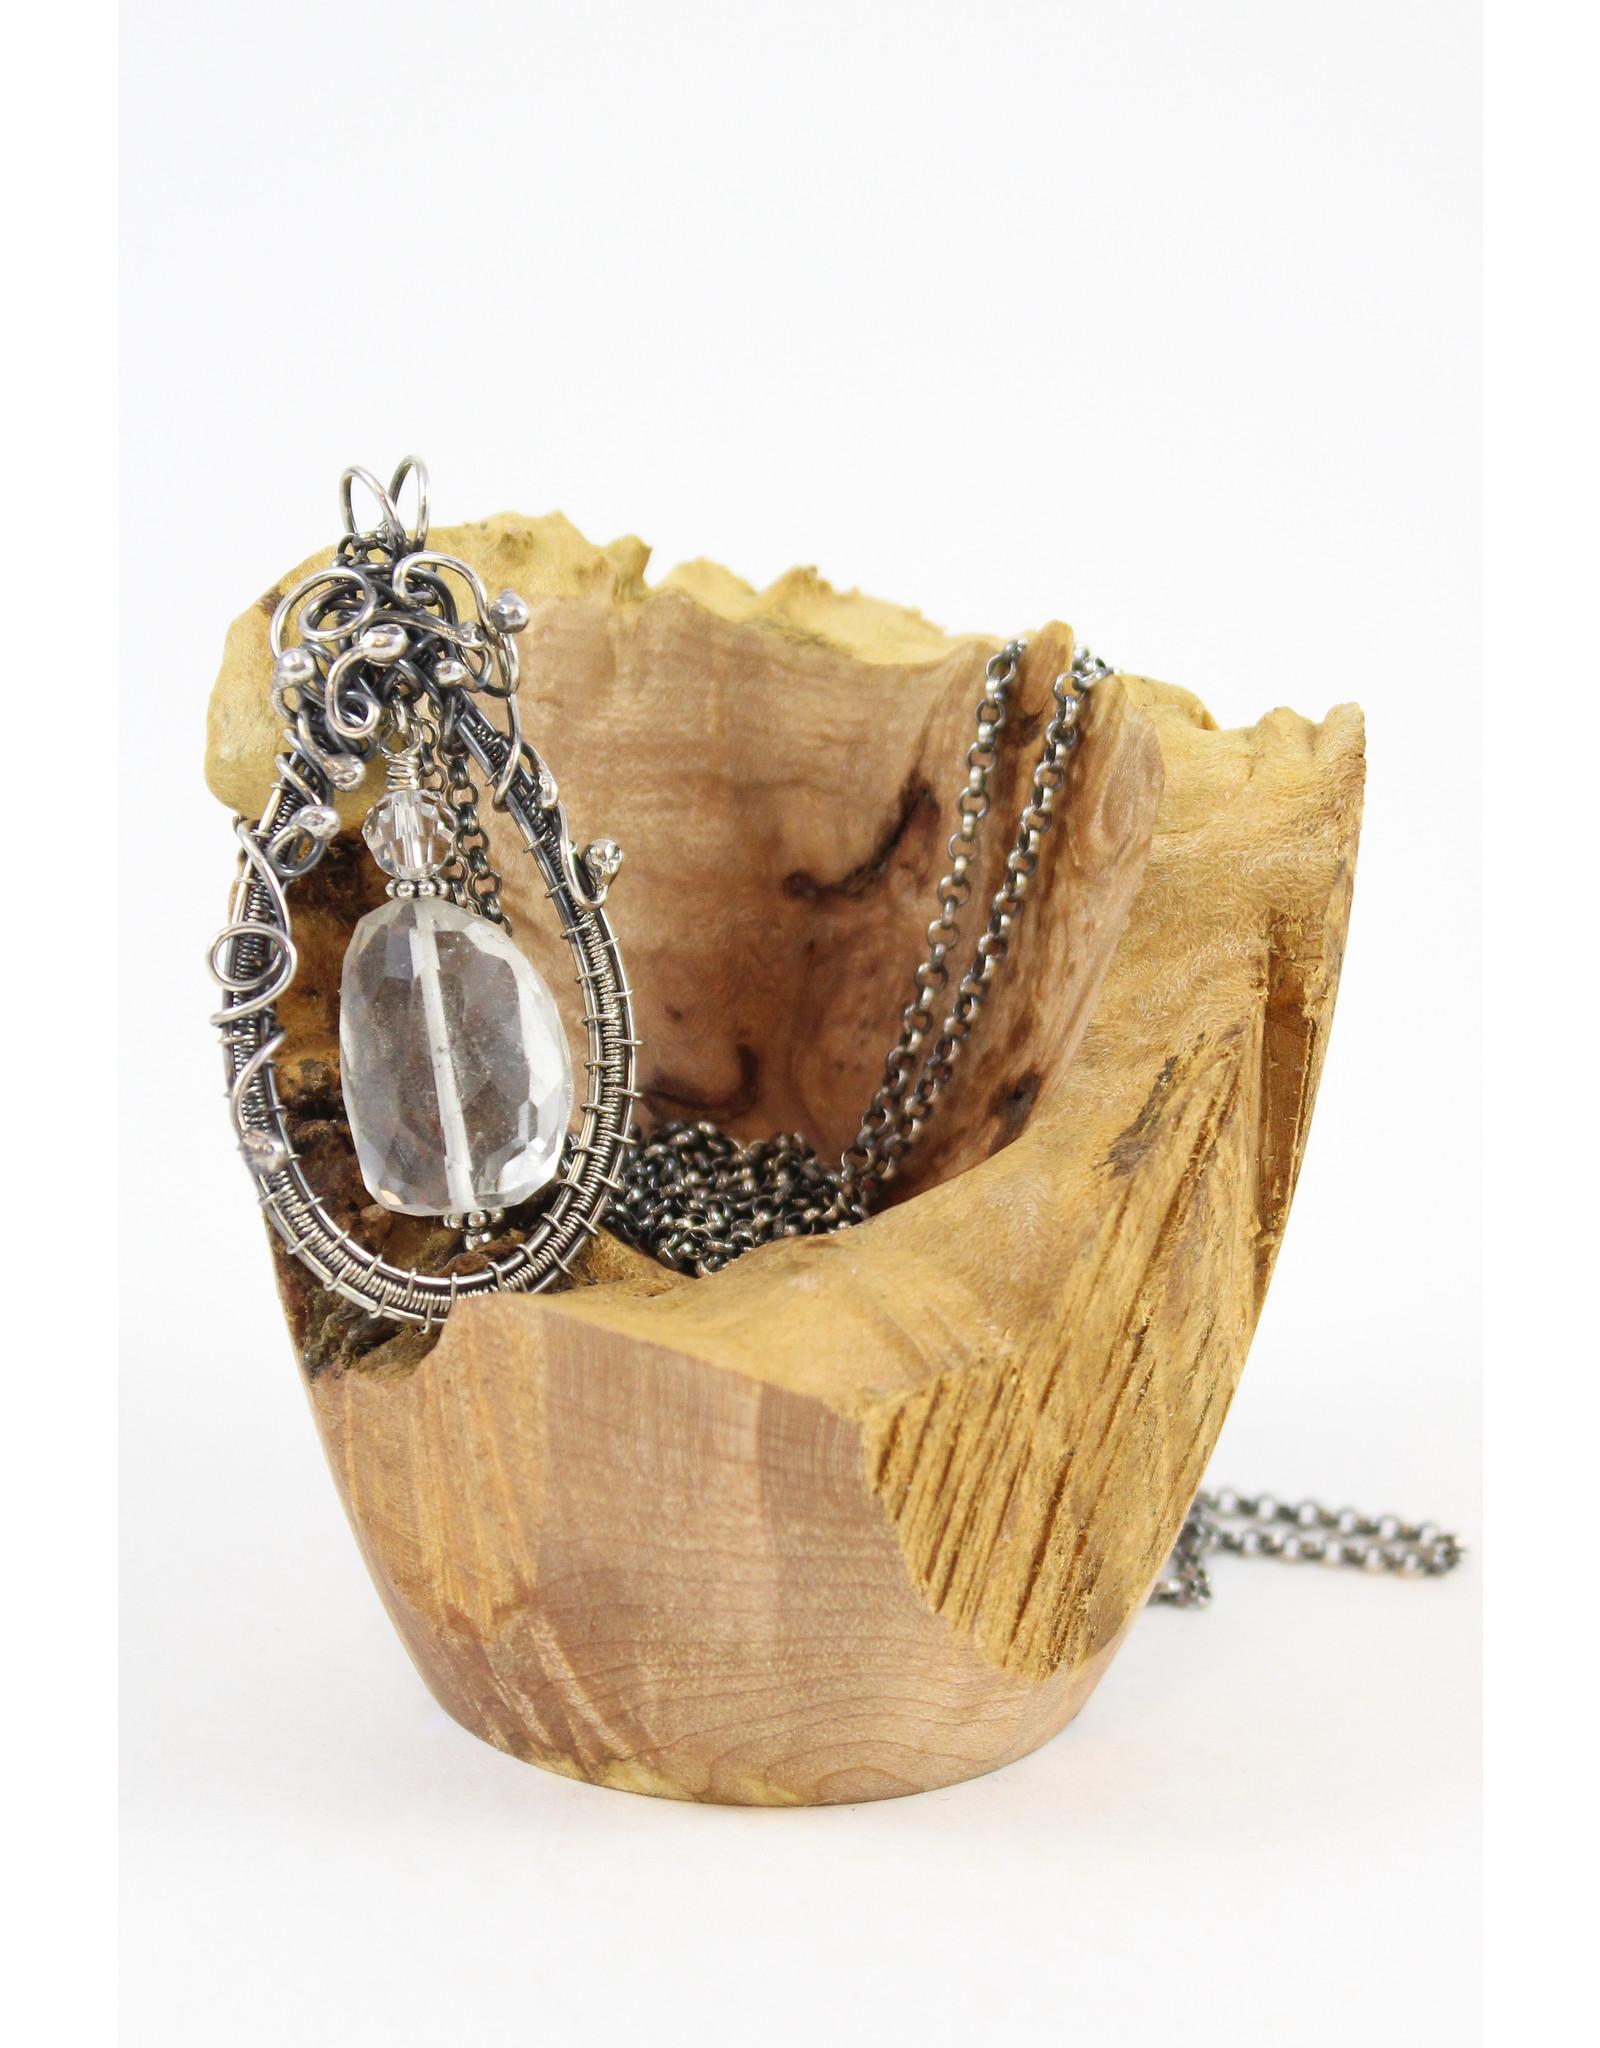 Tasha Matthews Quartz and Crystal Pendant by Tasha Grace Designs